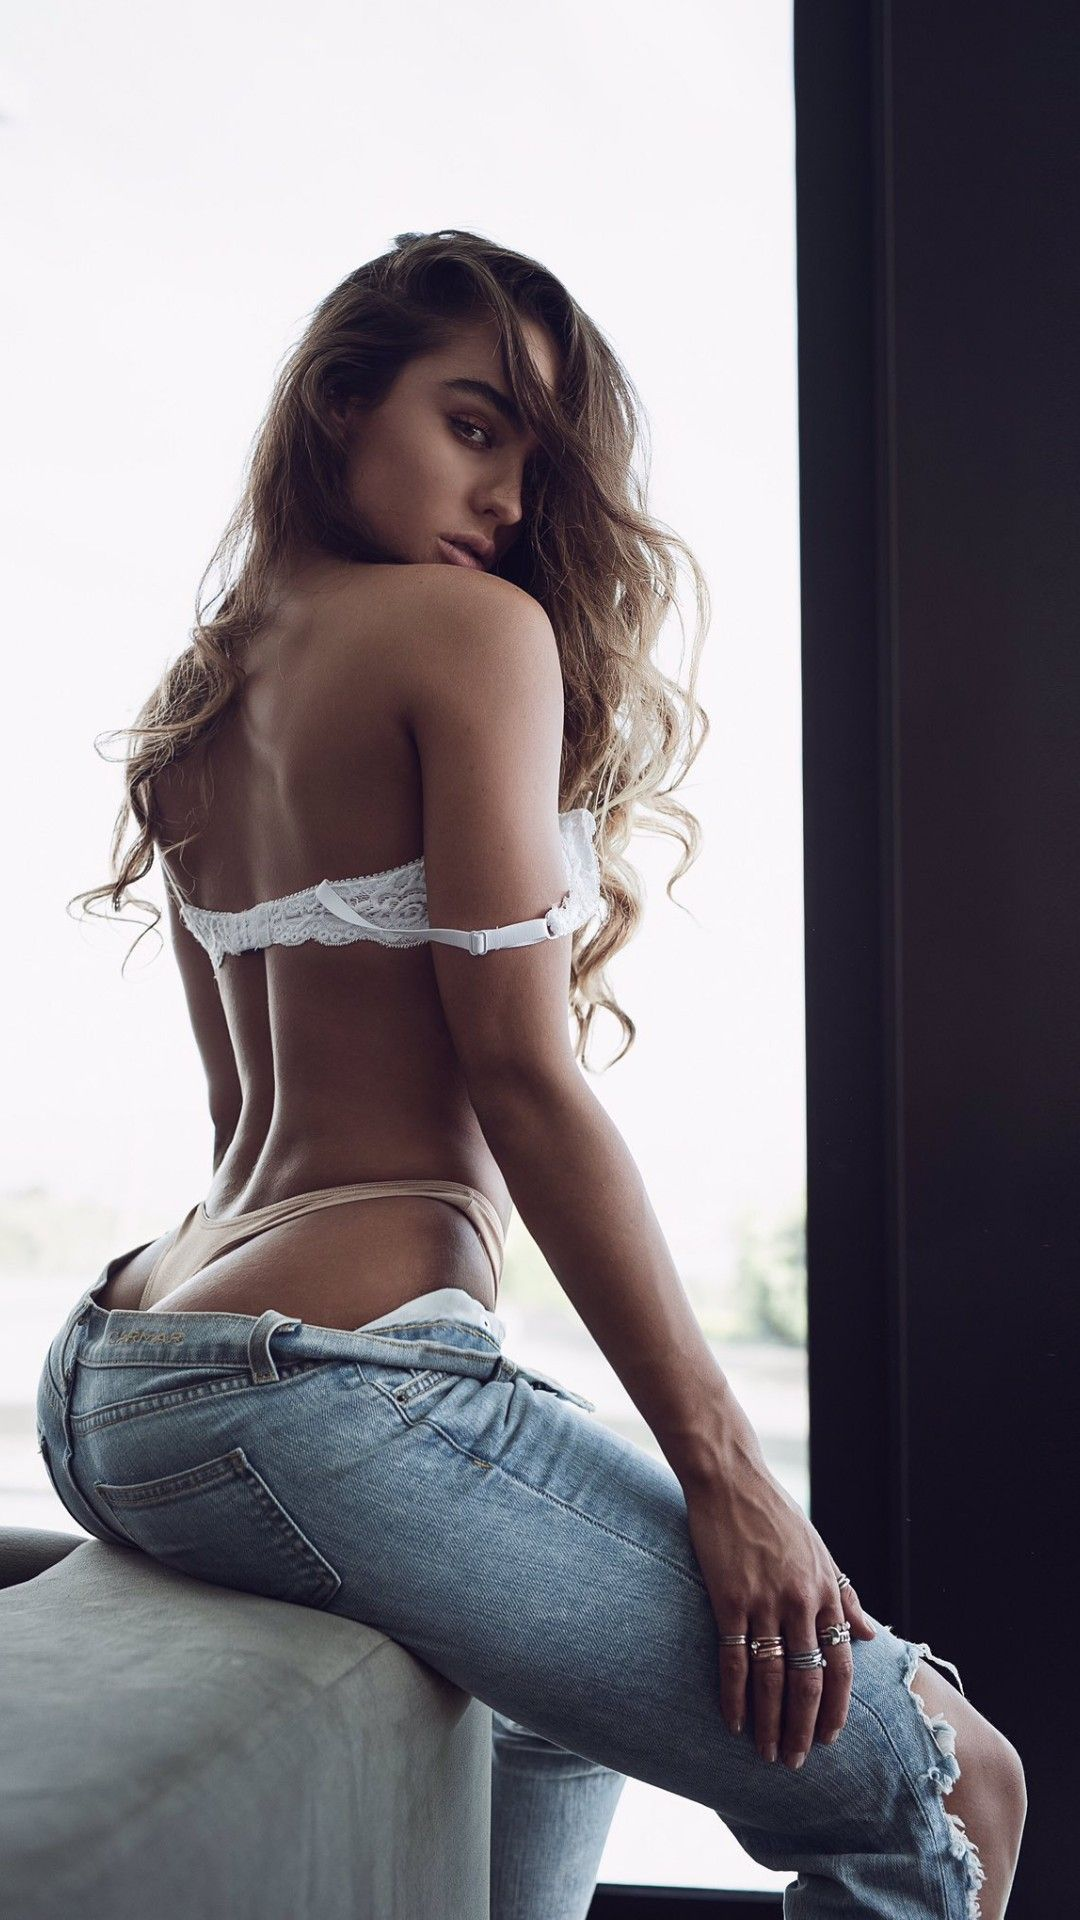 Cleavage Katlin Aas nudes (82 foto and video), Pussy, Bikini, Instagram, bra 2006